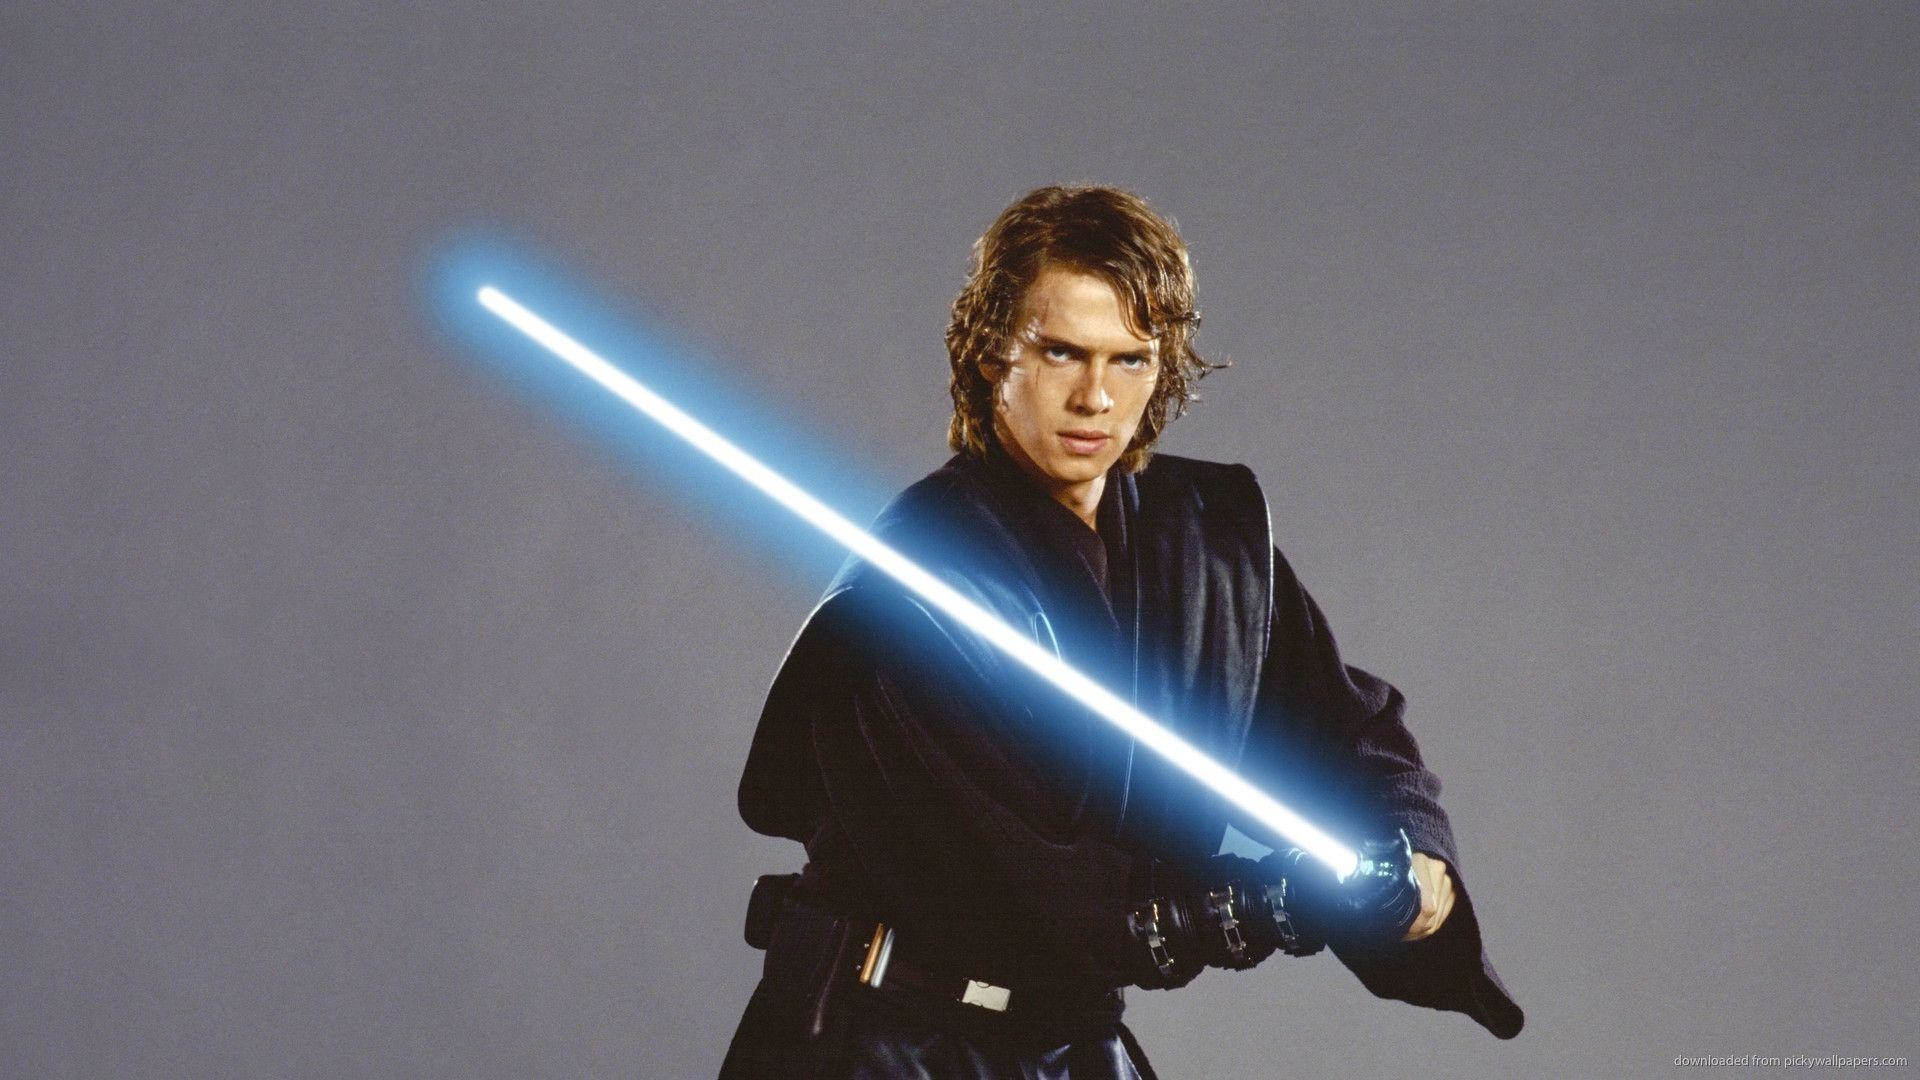 Luke Skywalker Wallpaper Hd 72 Images